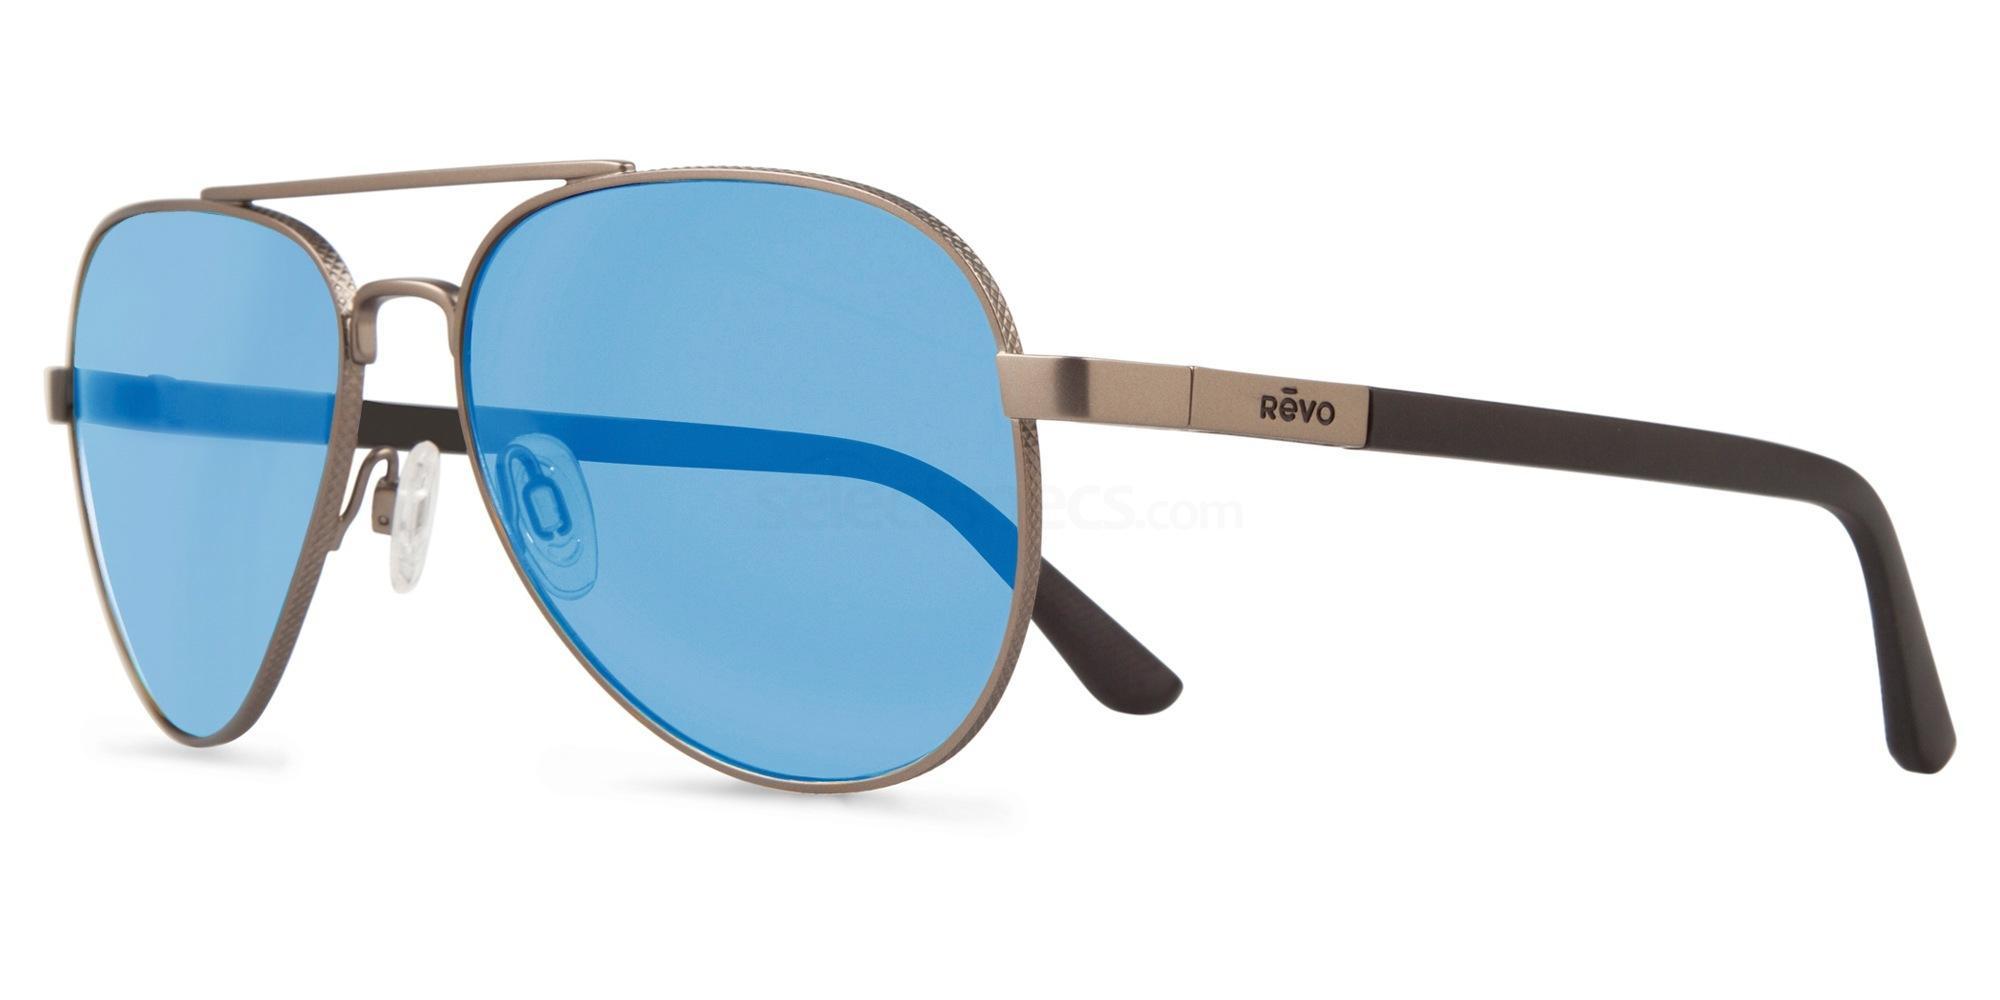 Revo Raconteur RE1011 sunglasses